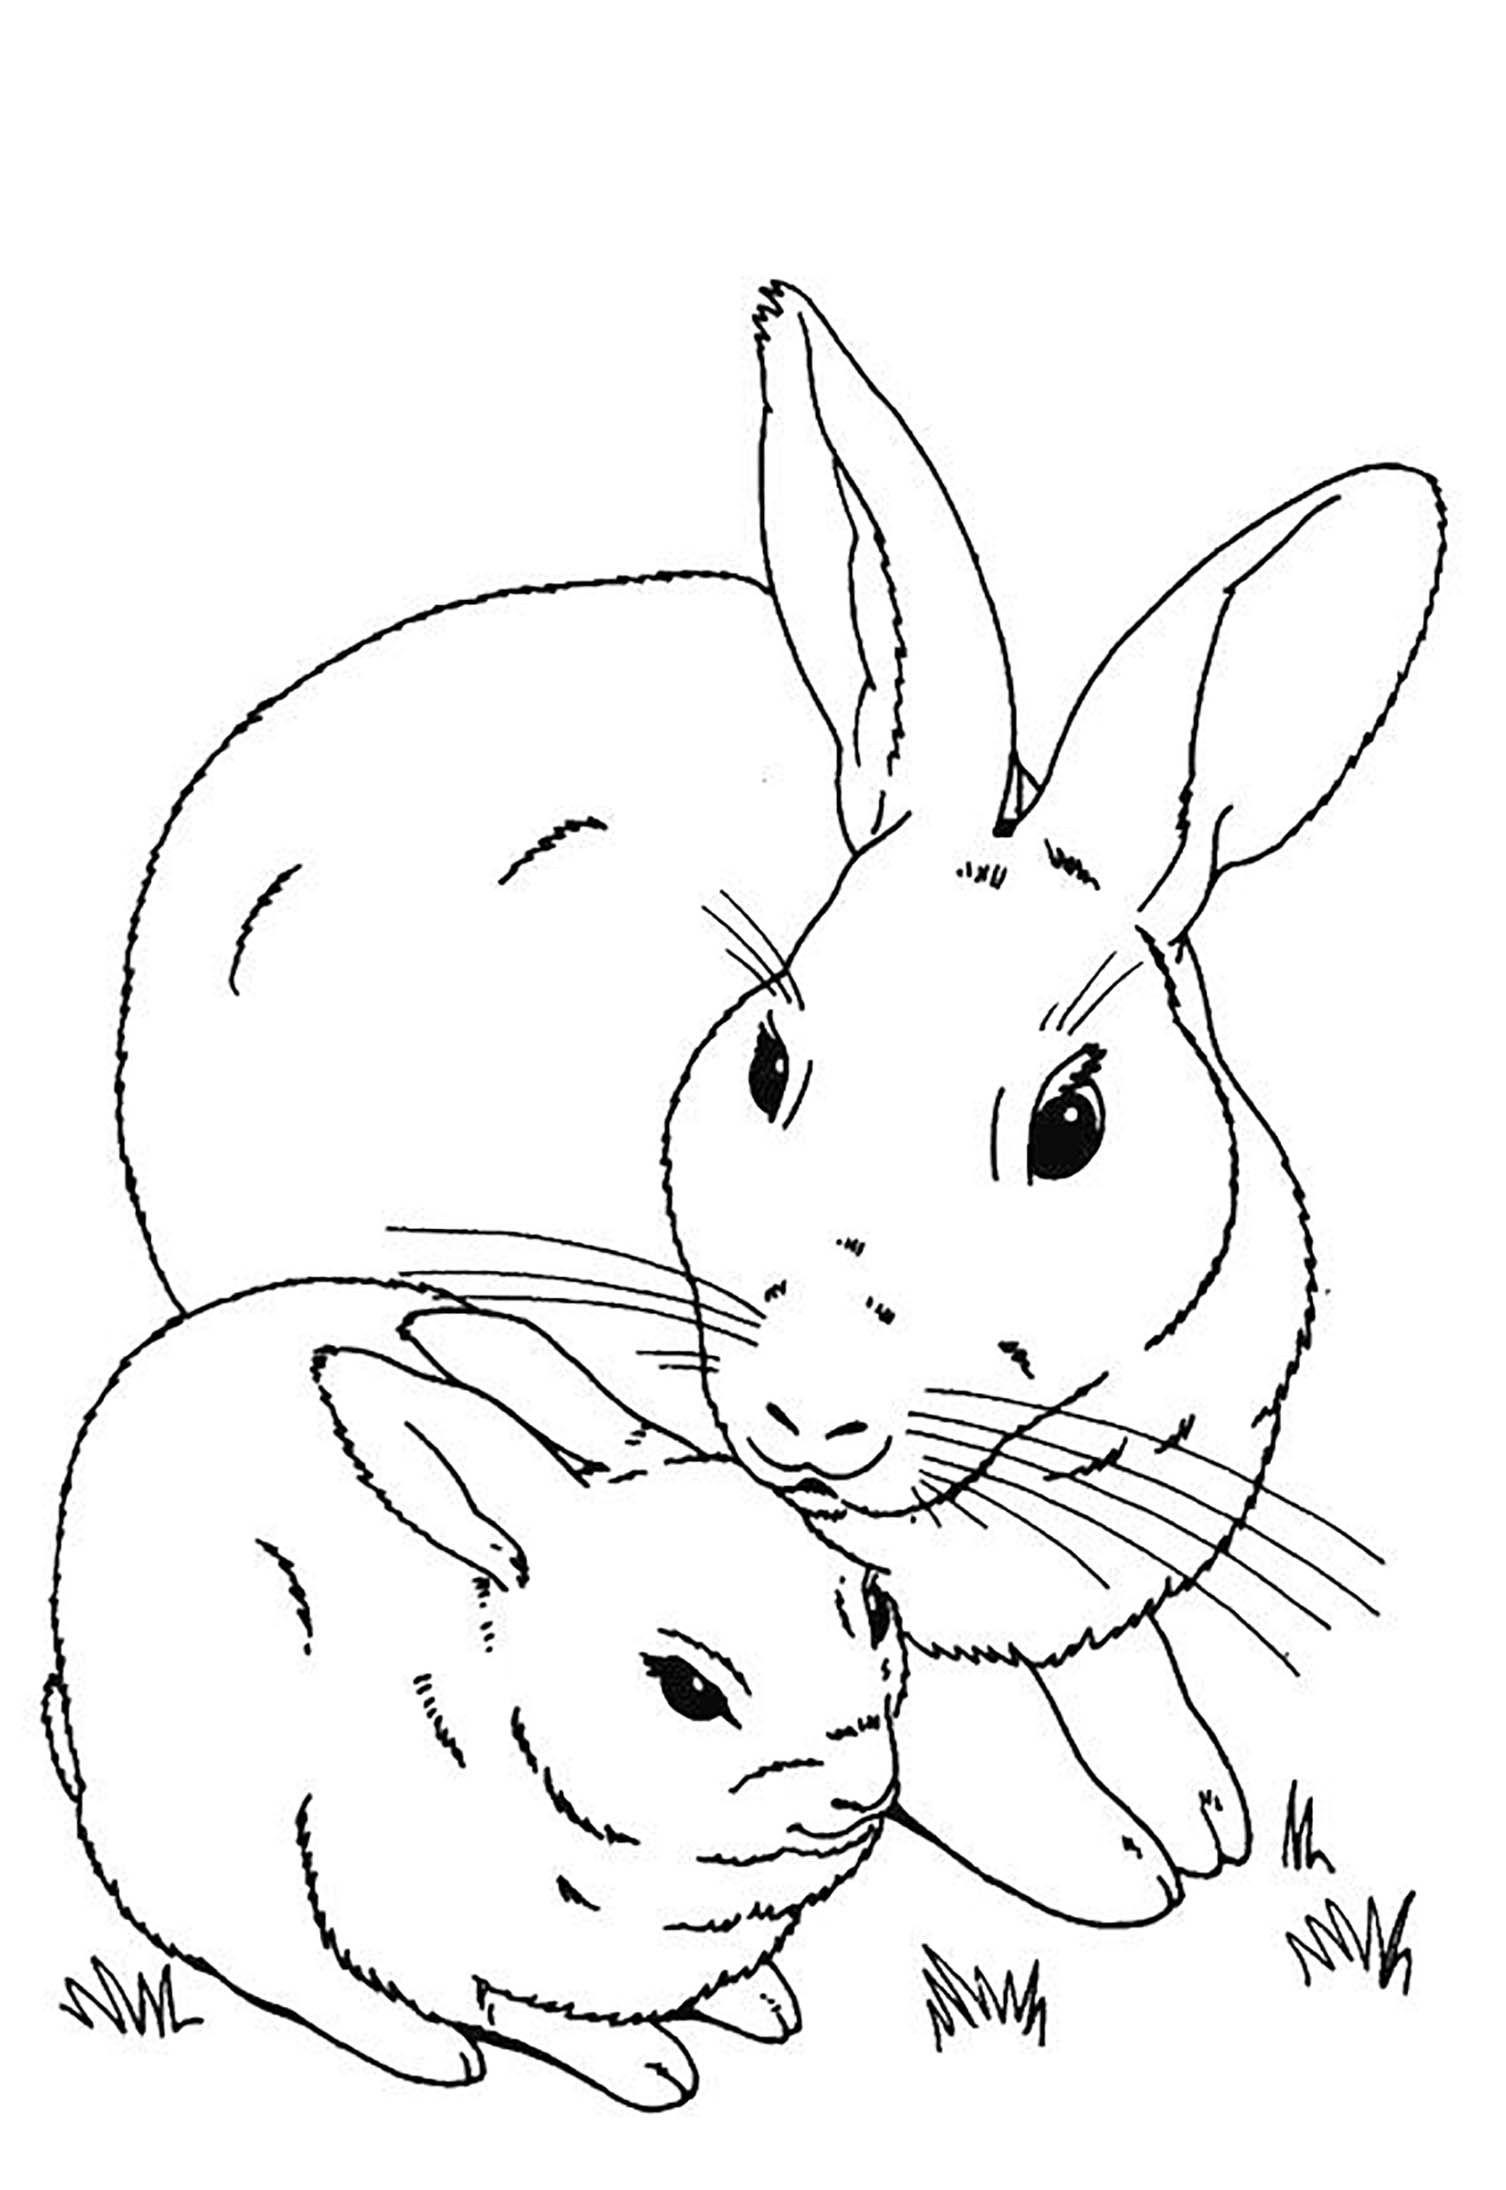 Rabbit To Color For Children Rabbit Kids Coloring Pages In 2021 Bunny Coloring Pages Coloring Pages Coloring For Kids